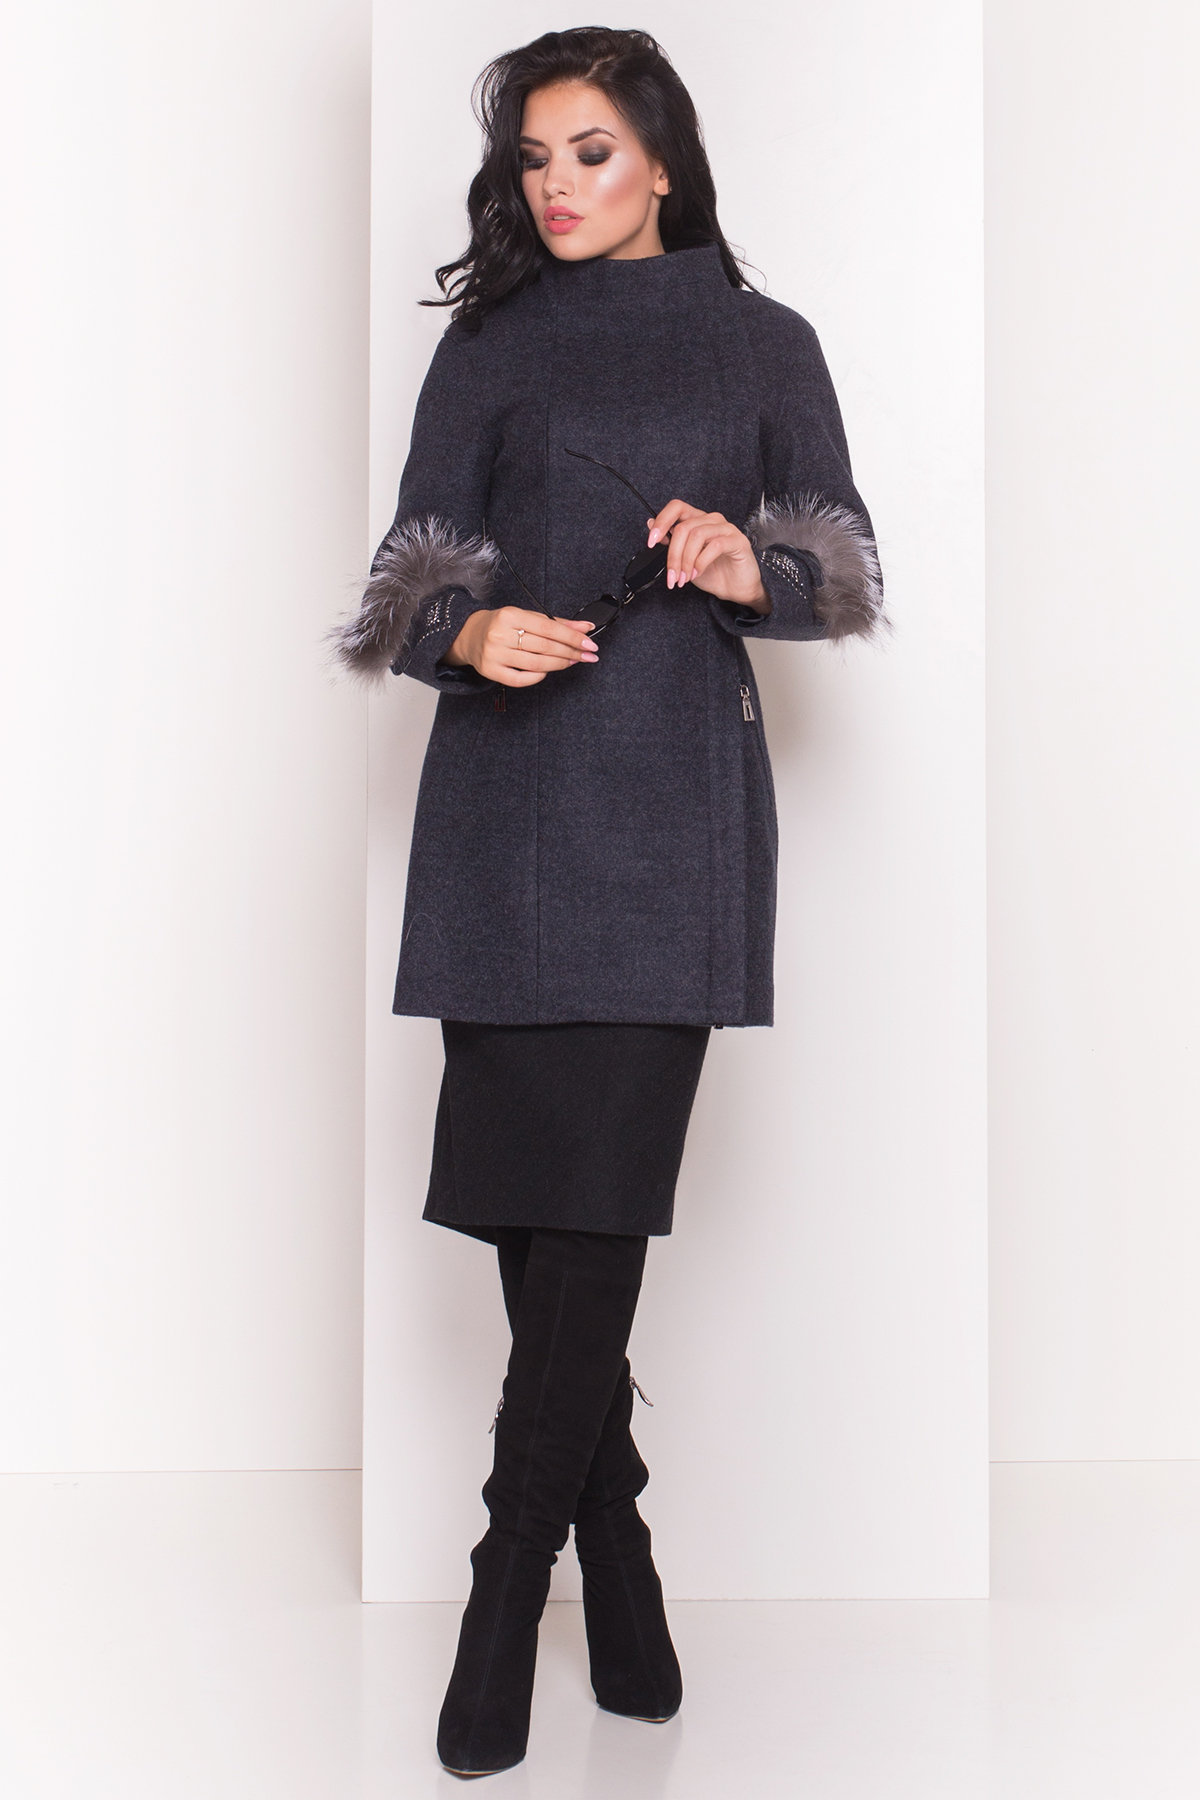 Пальто Лорин 4478 АРТ. 21567 Цвет: Темно-синий - фото 3, интернет магазин tm-modus.ru